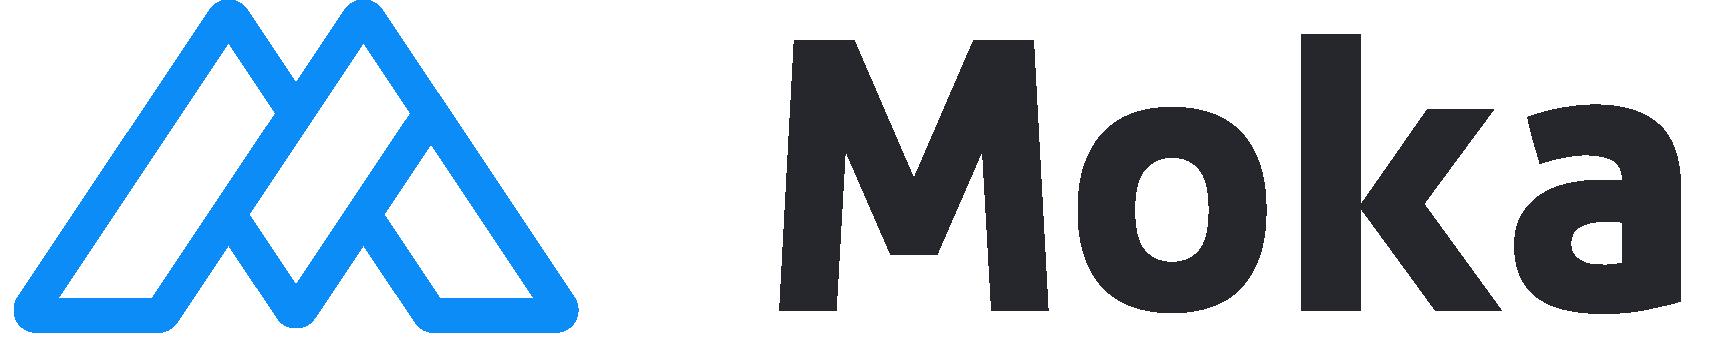 moka-logo